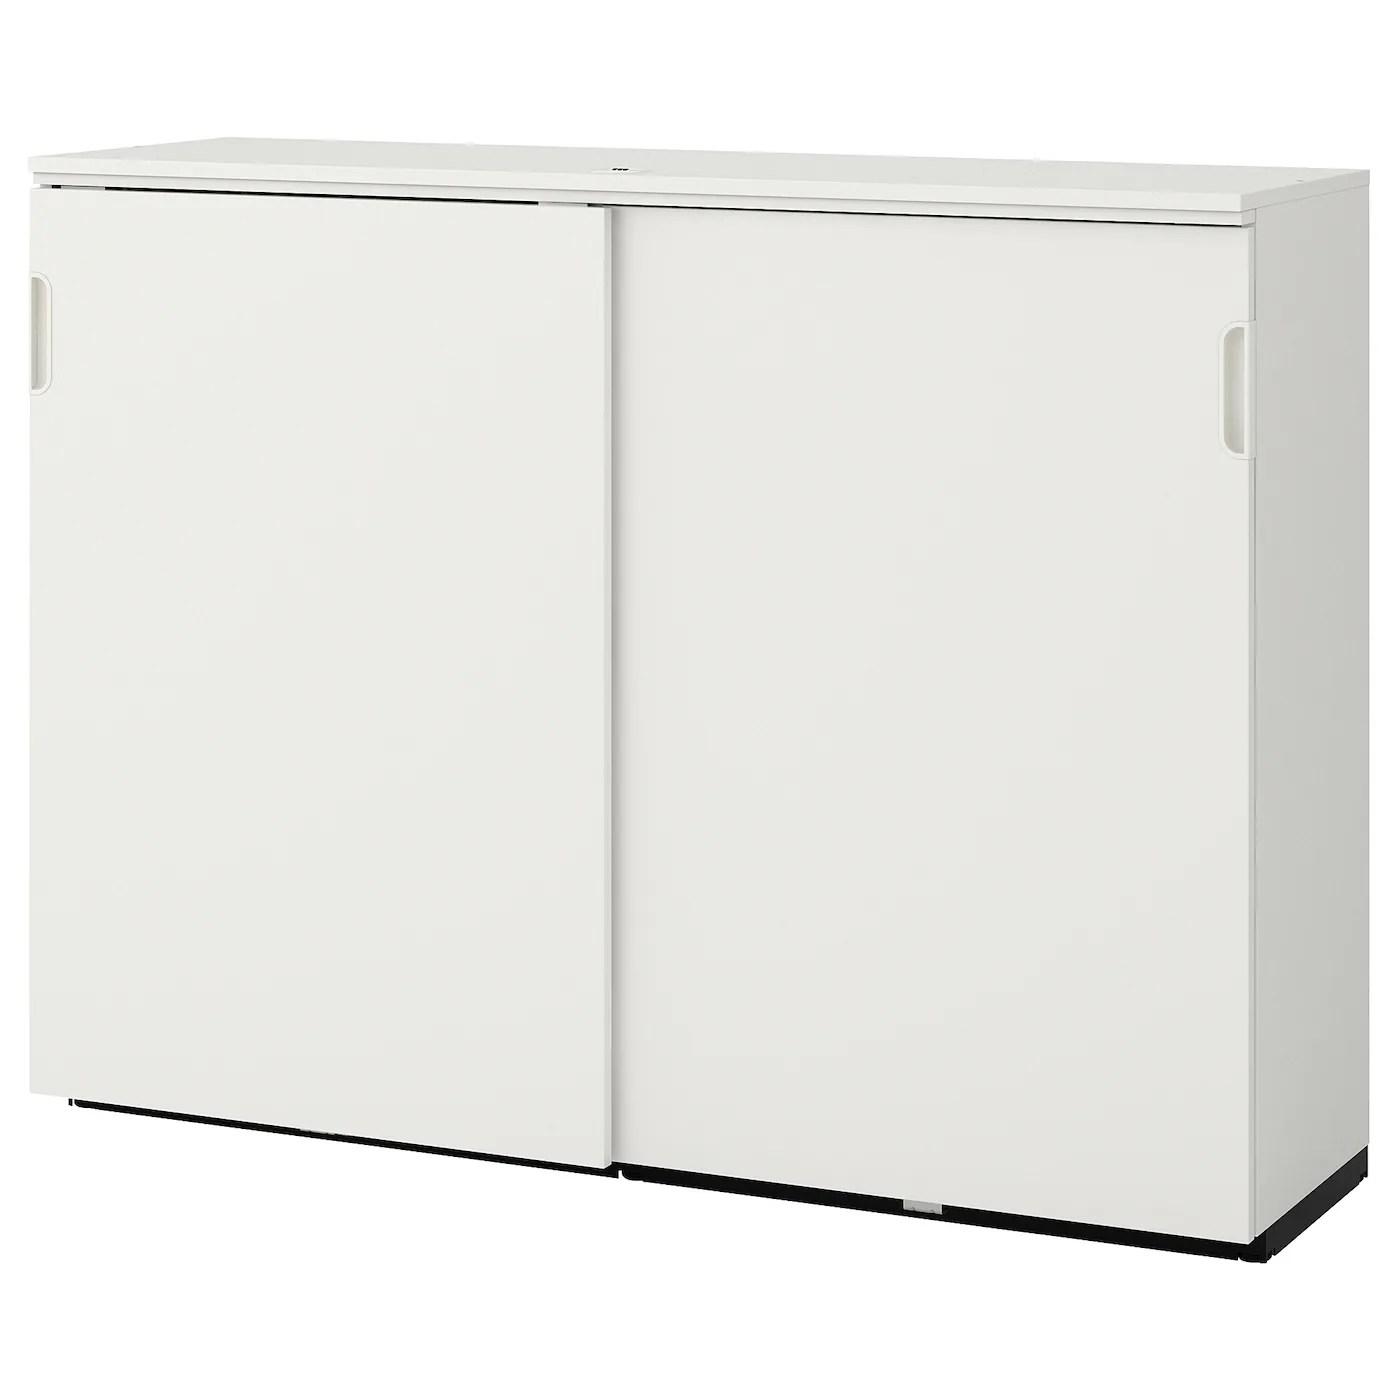 Galant Cabinet With Sliding Doors White 160x120 Cm Ikea